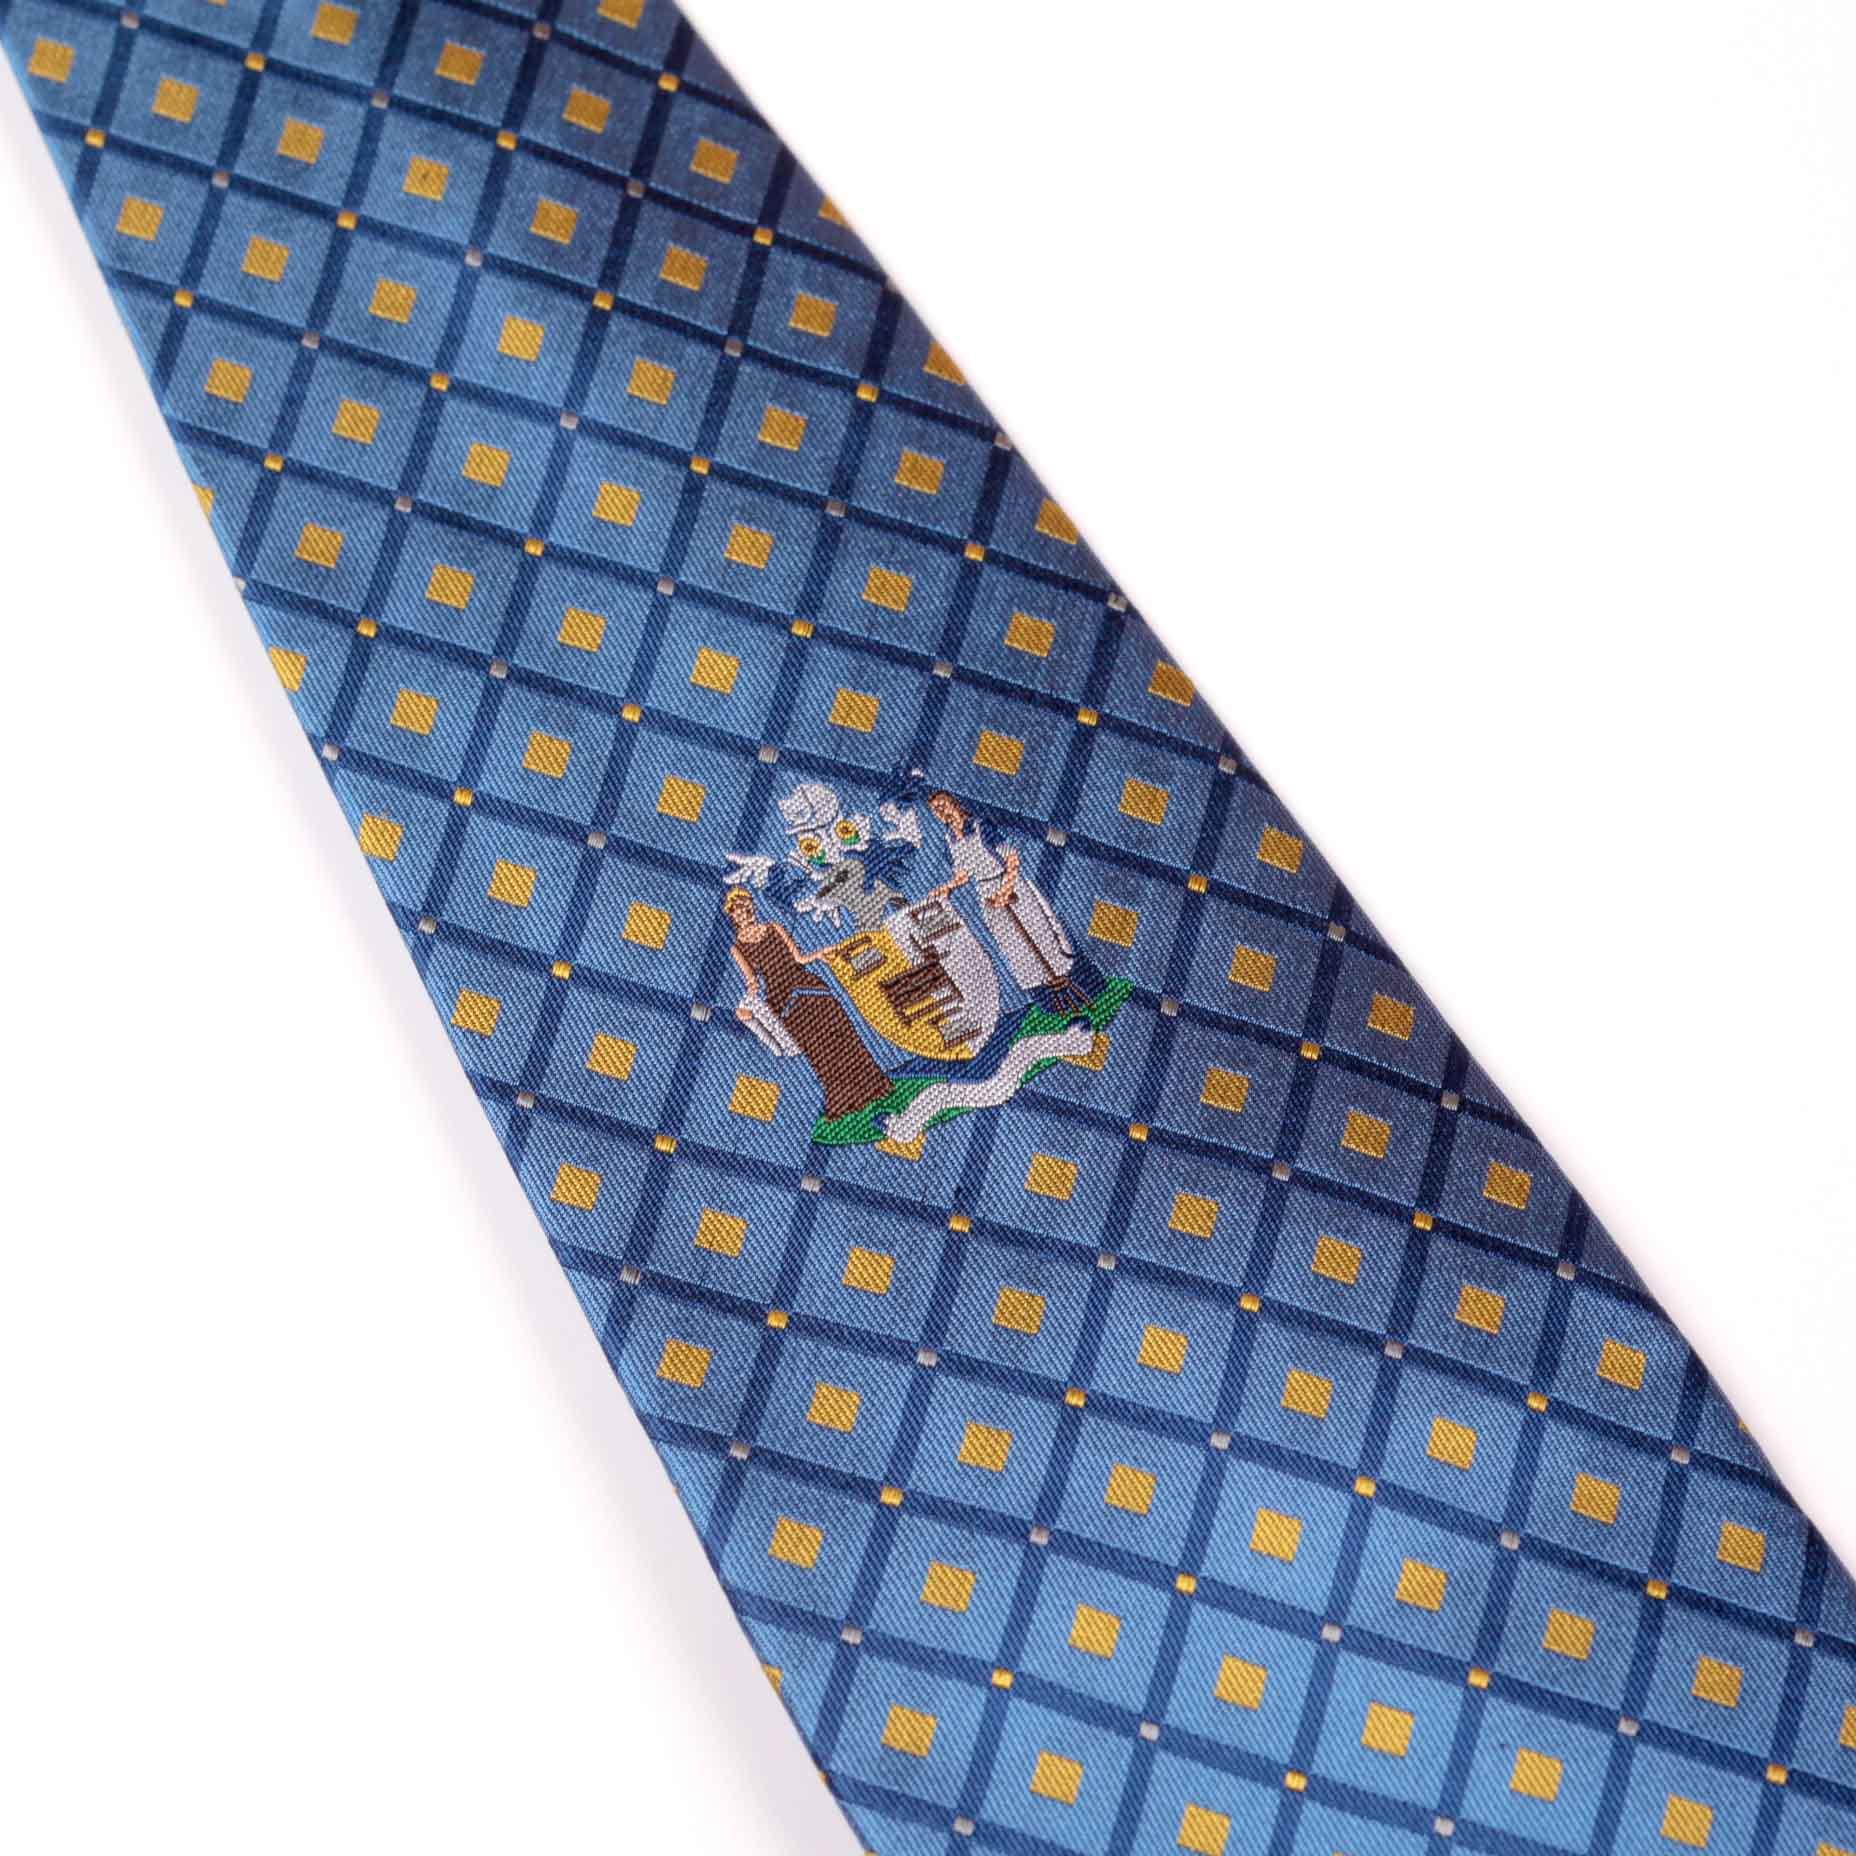 Blue tie with diamonds and logo